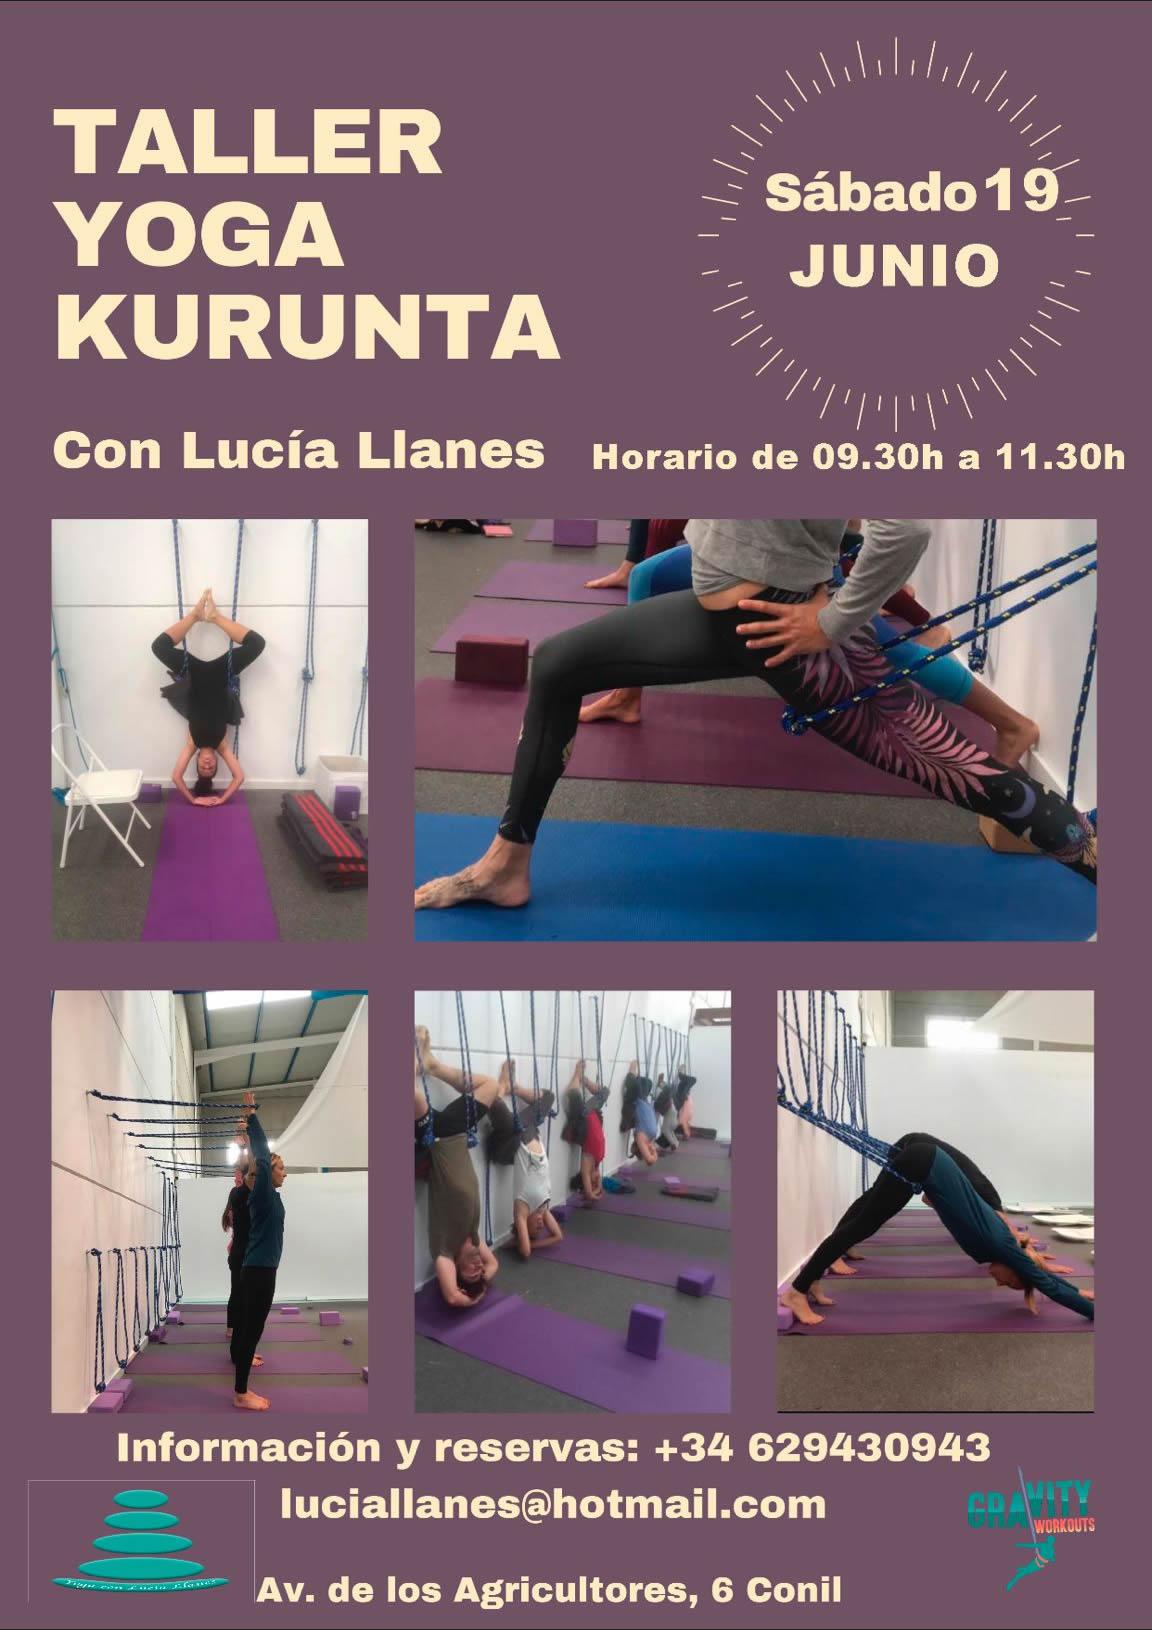 Taller de Yoga Kurunta 'yoga con cuerdas en la pared' en Gravity Workouts